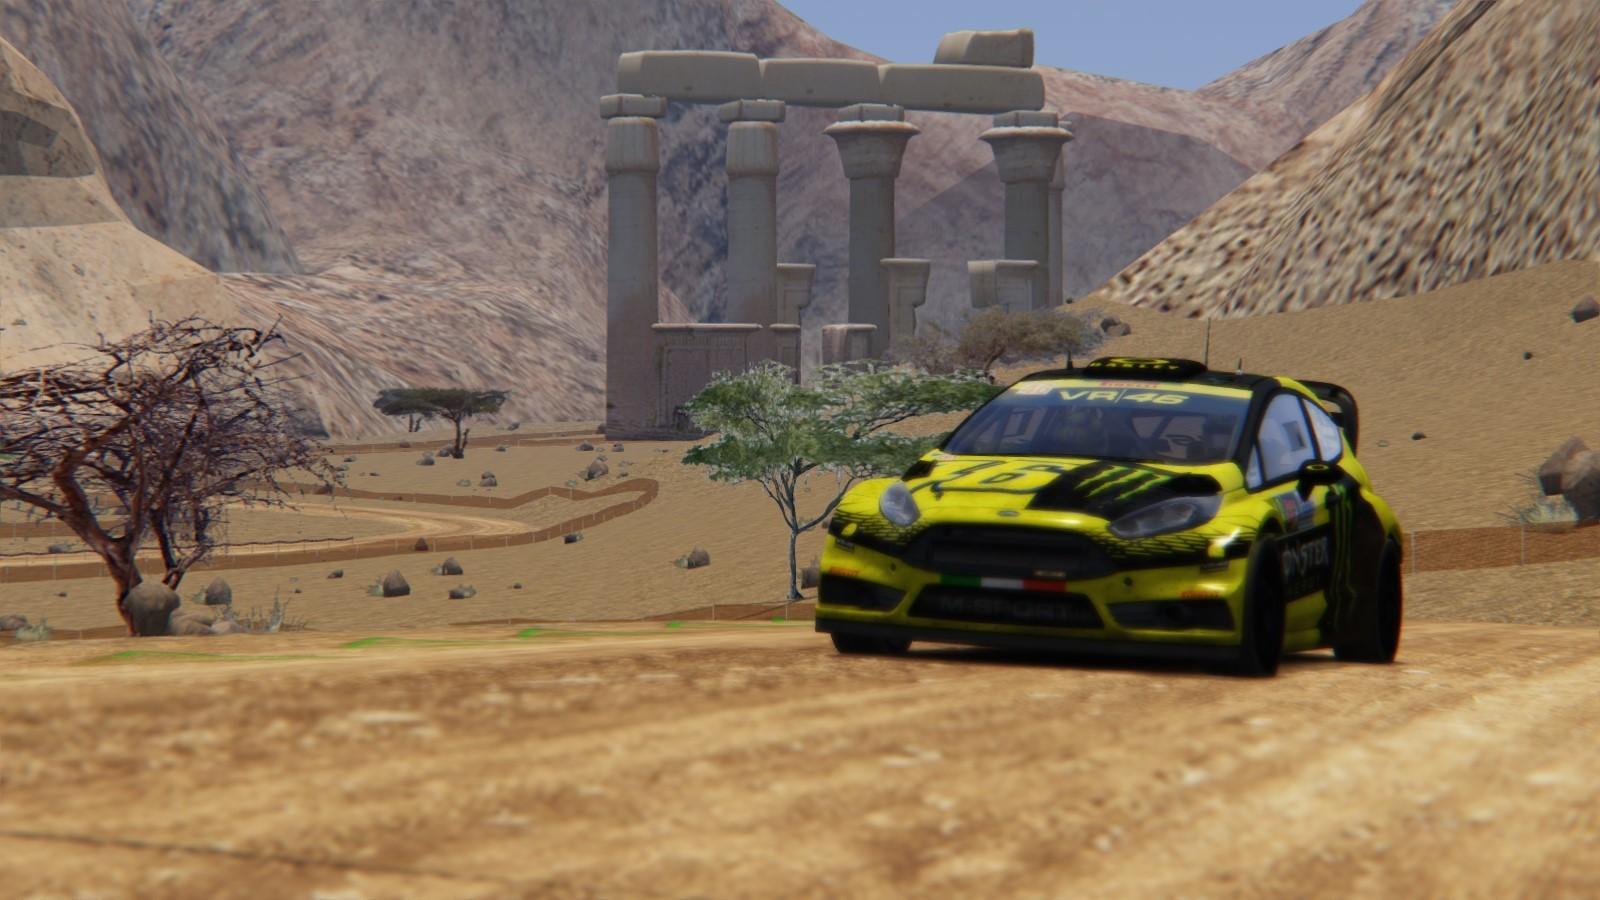 ArtStation - Assetto Corsa Rally Track Mod, Davide Prestino